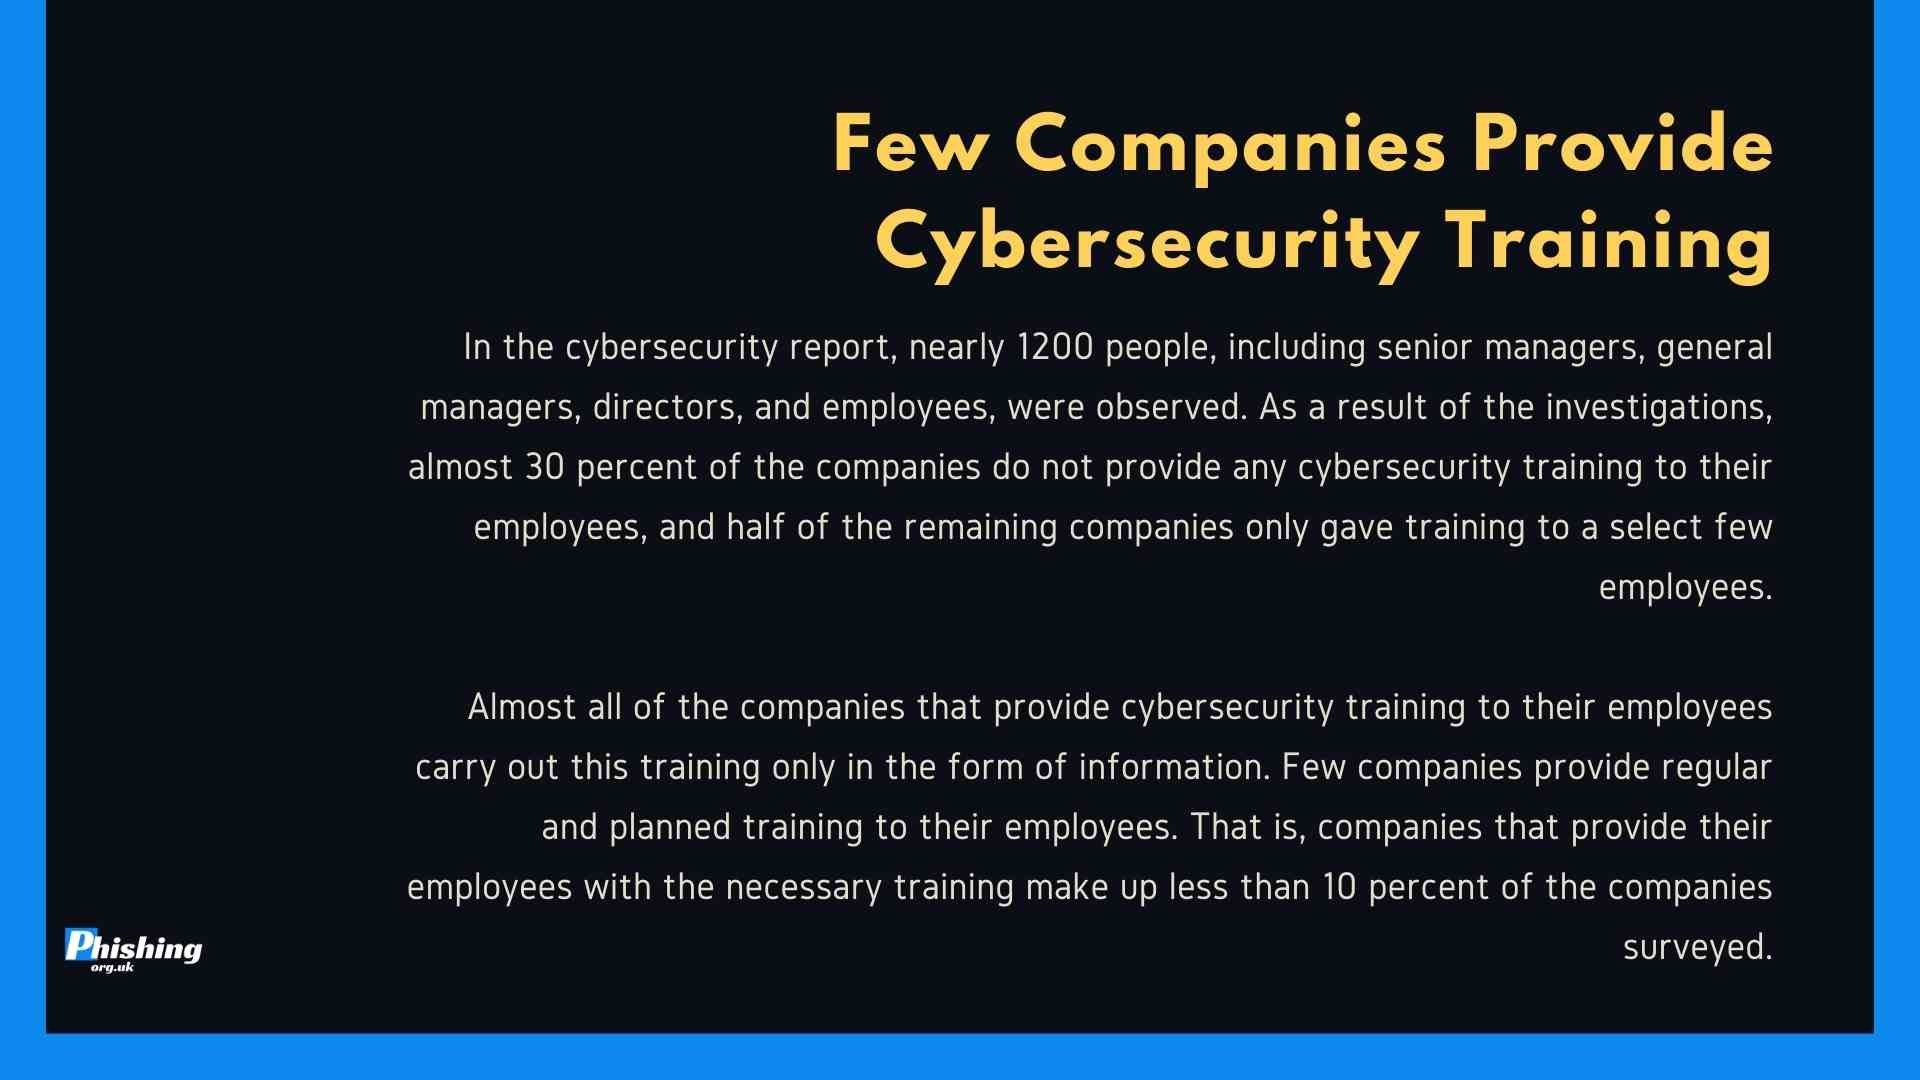 Few Companies Provide Cybersecurity Training